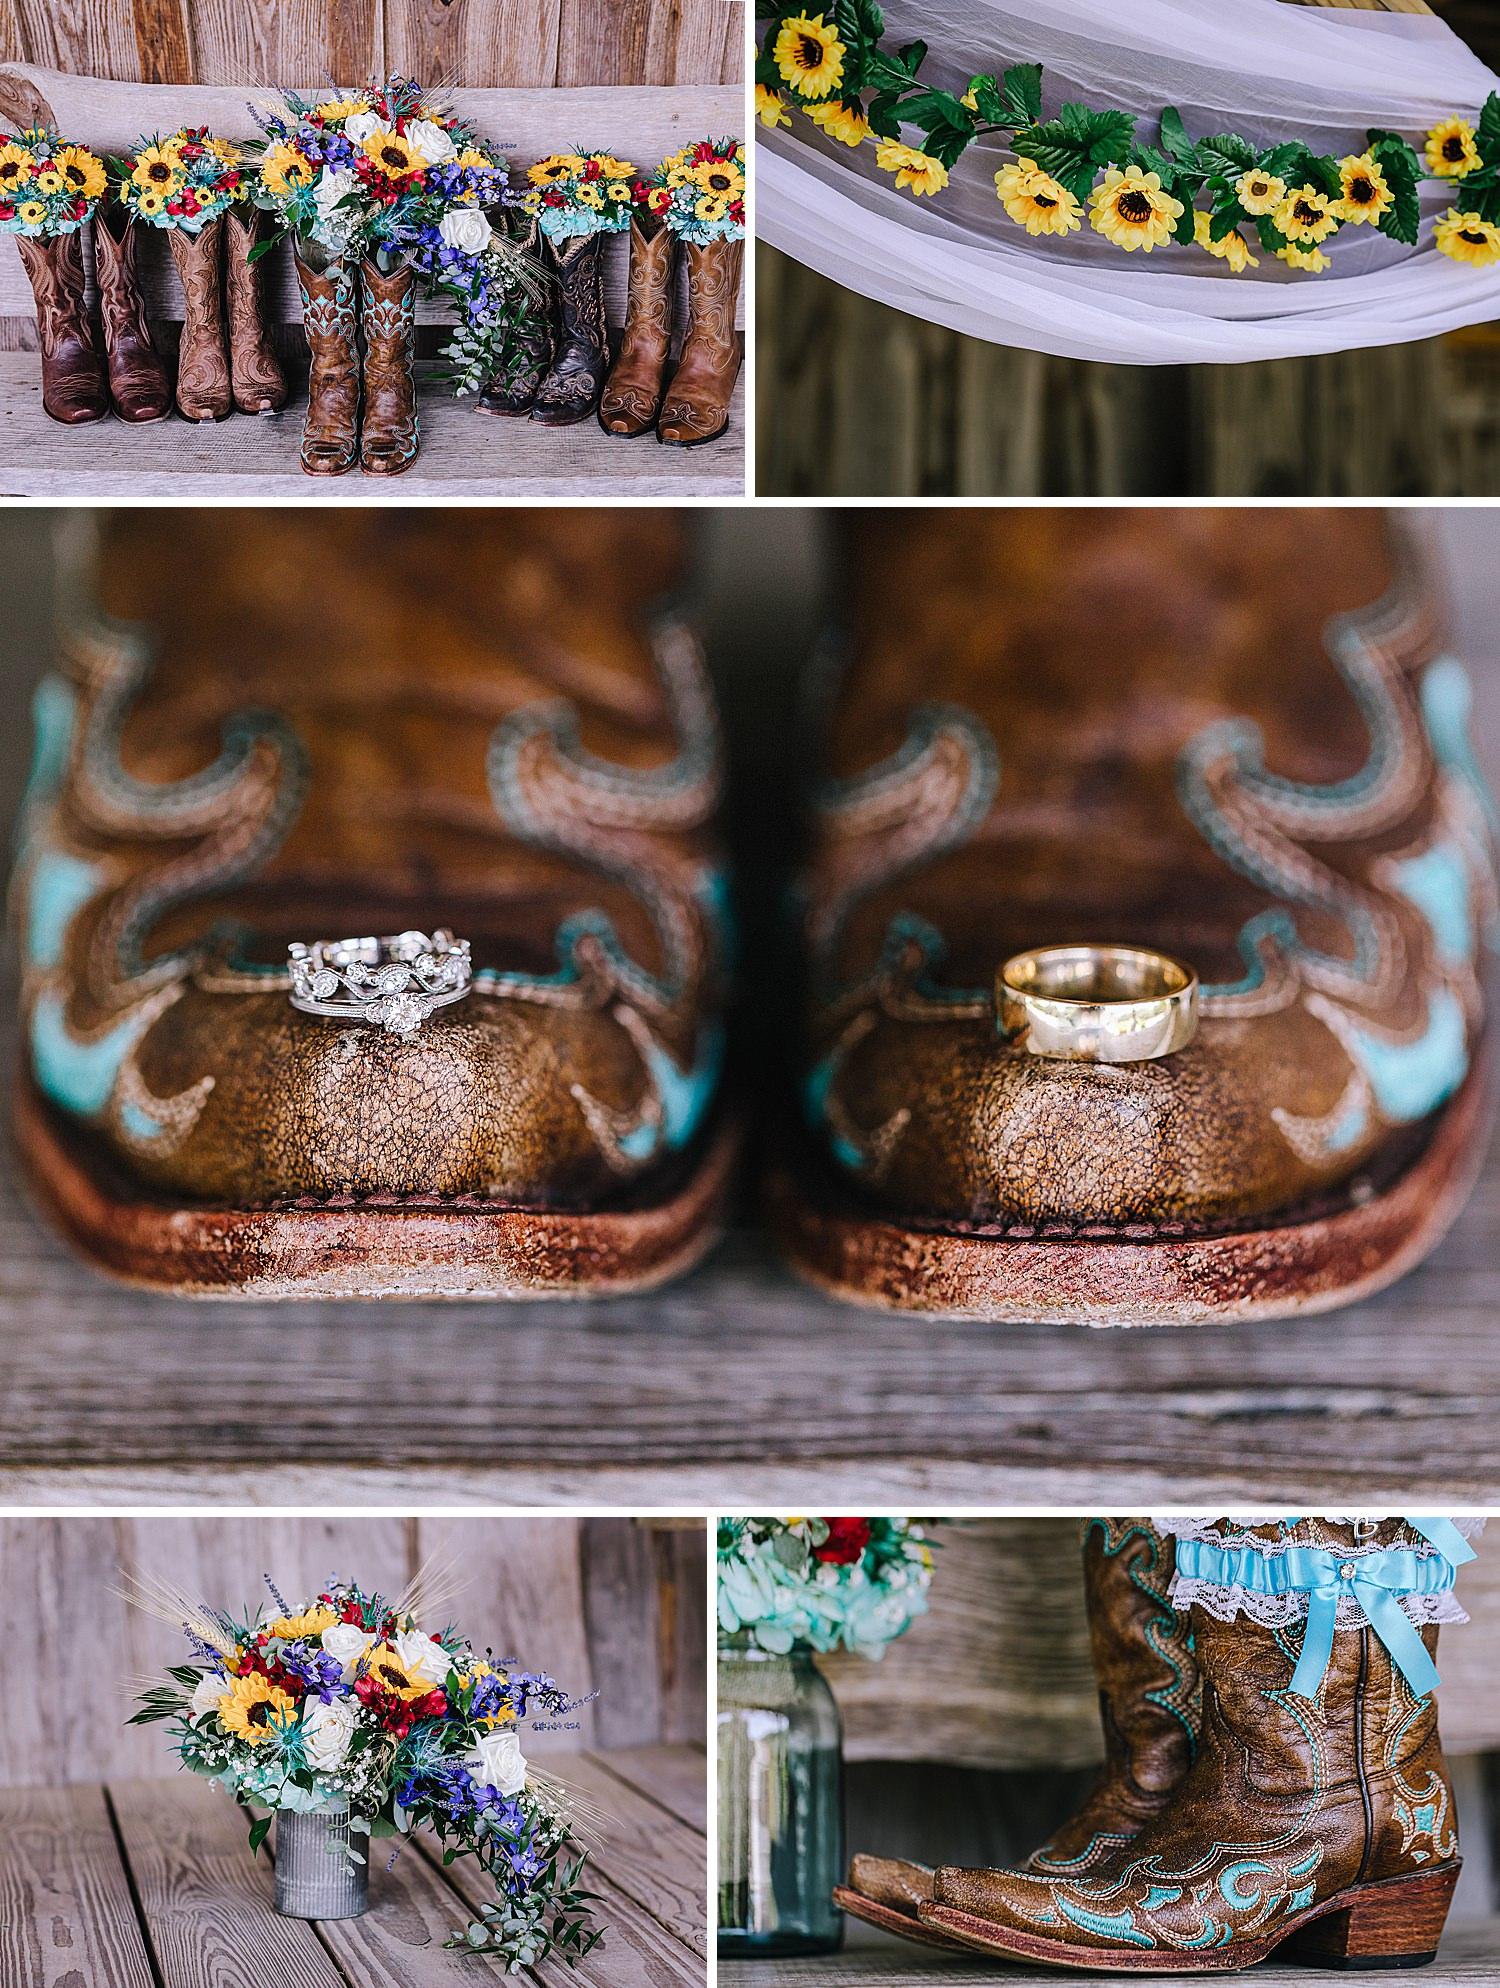 Carly-Barton-Photography-Old-Town-Texas-Rustic-Wedding-Photos-Sunflowers-Boots-Kyle-Texas_0006.jpg